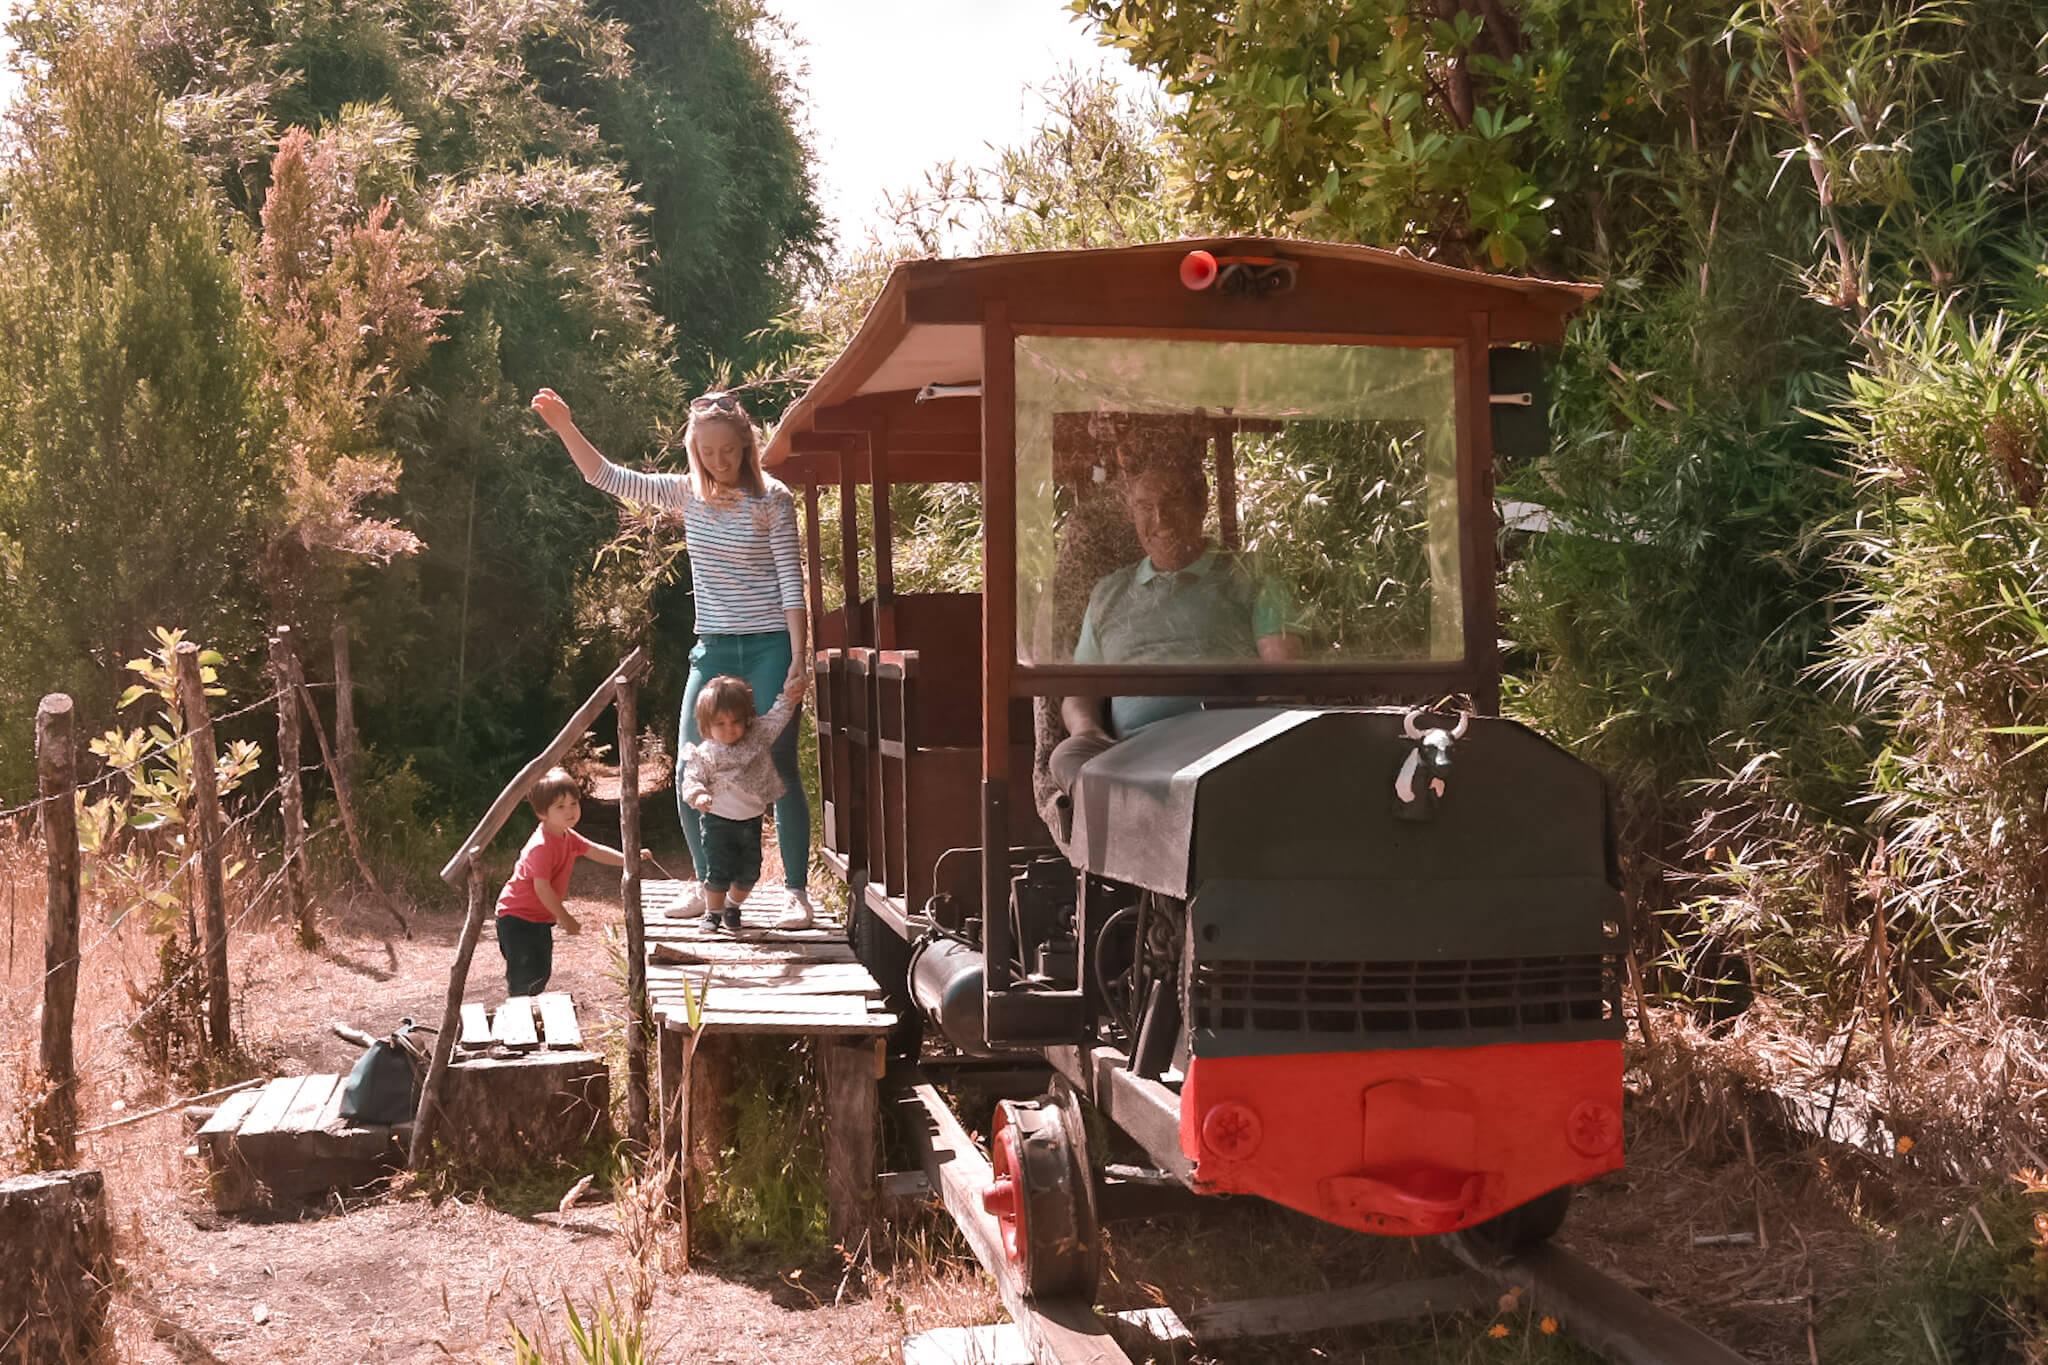 Chiloe island wooden train